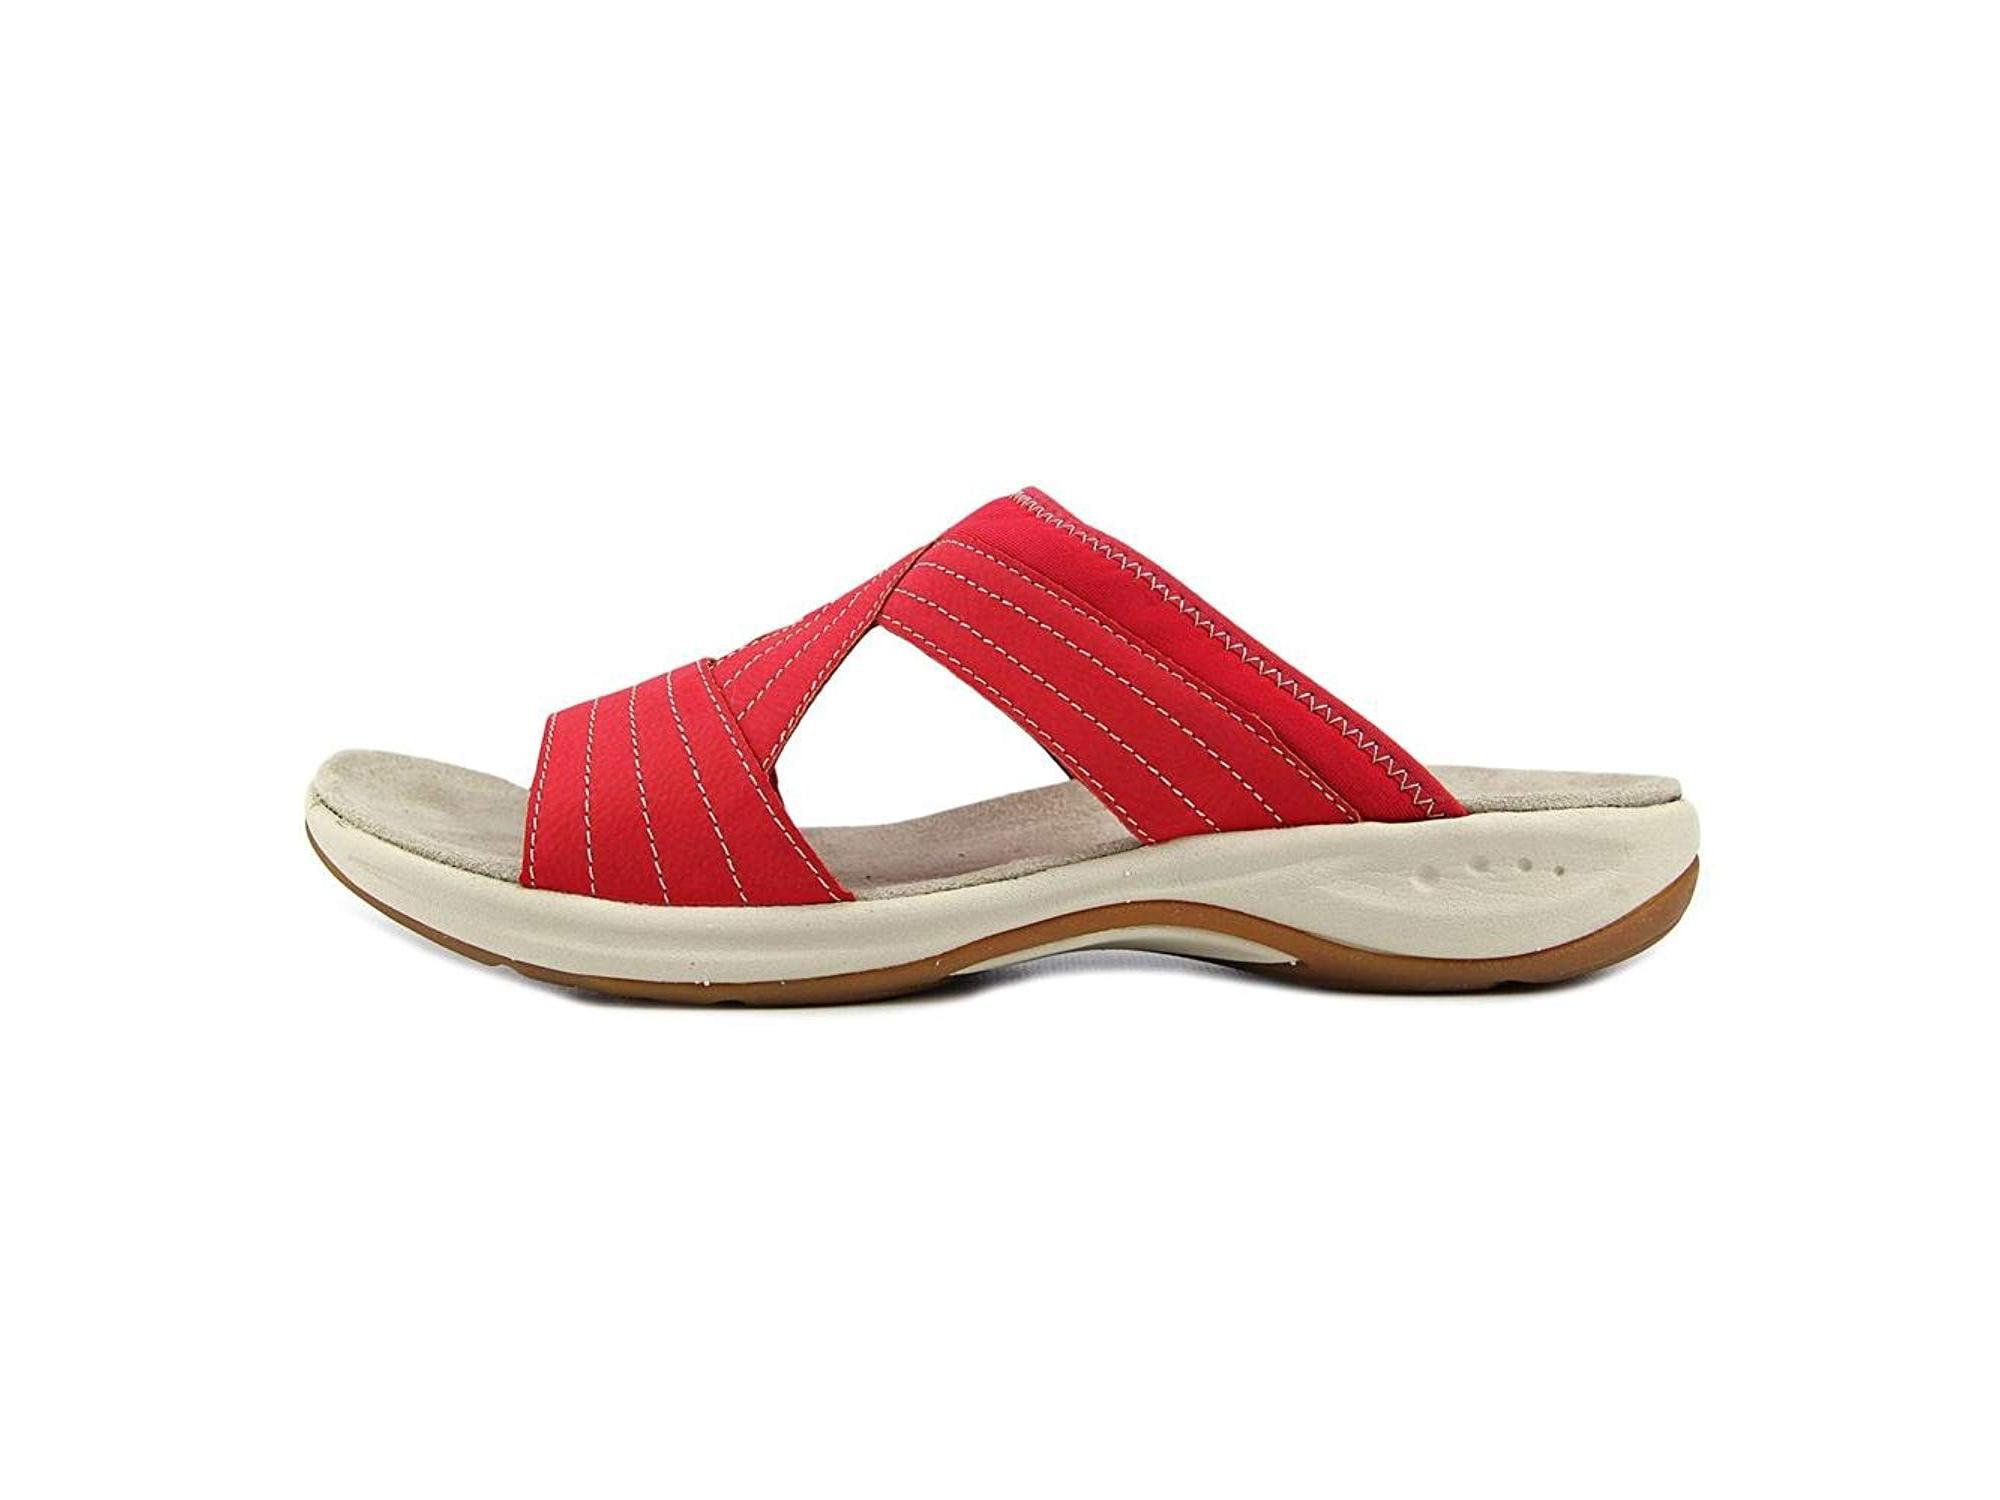 235ee2052a15 Easy Spirit Womens Emorie Open Toe Casual Slide Sandals